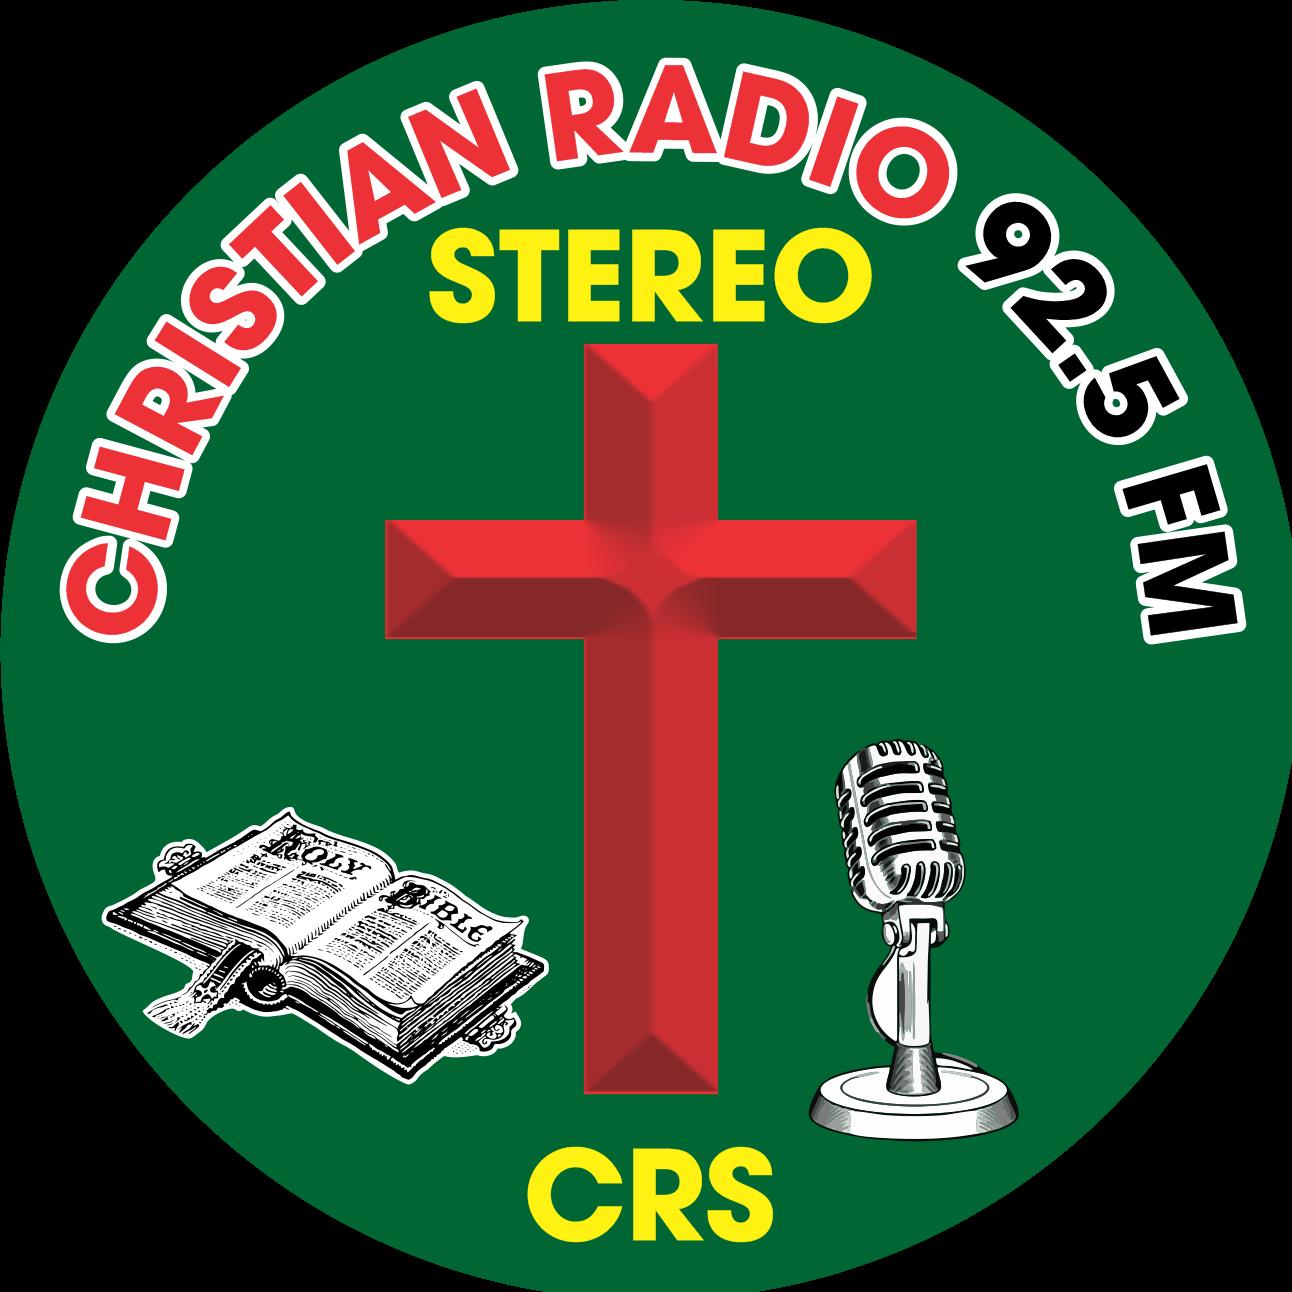 CHRISTIAN RADIO 92.5FM